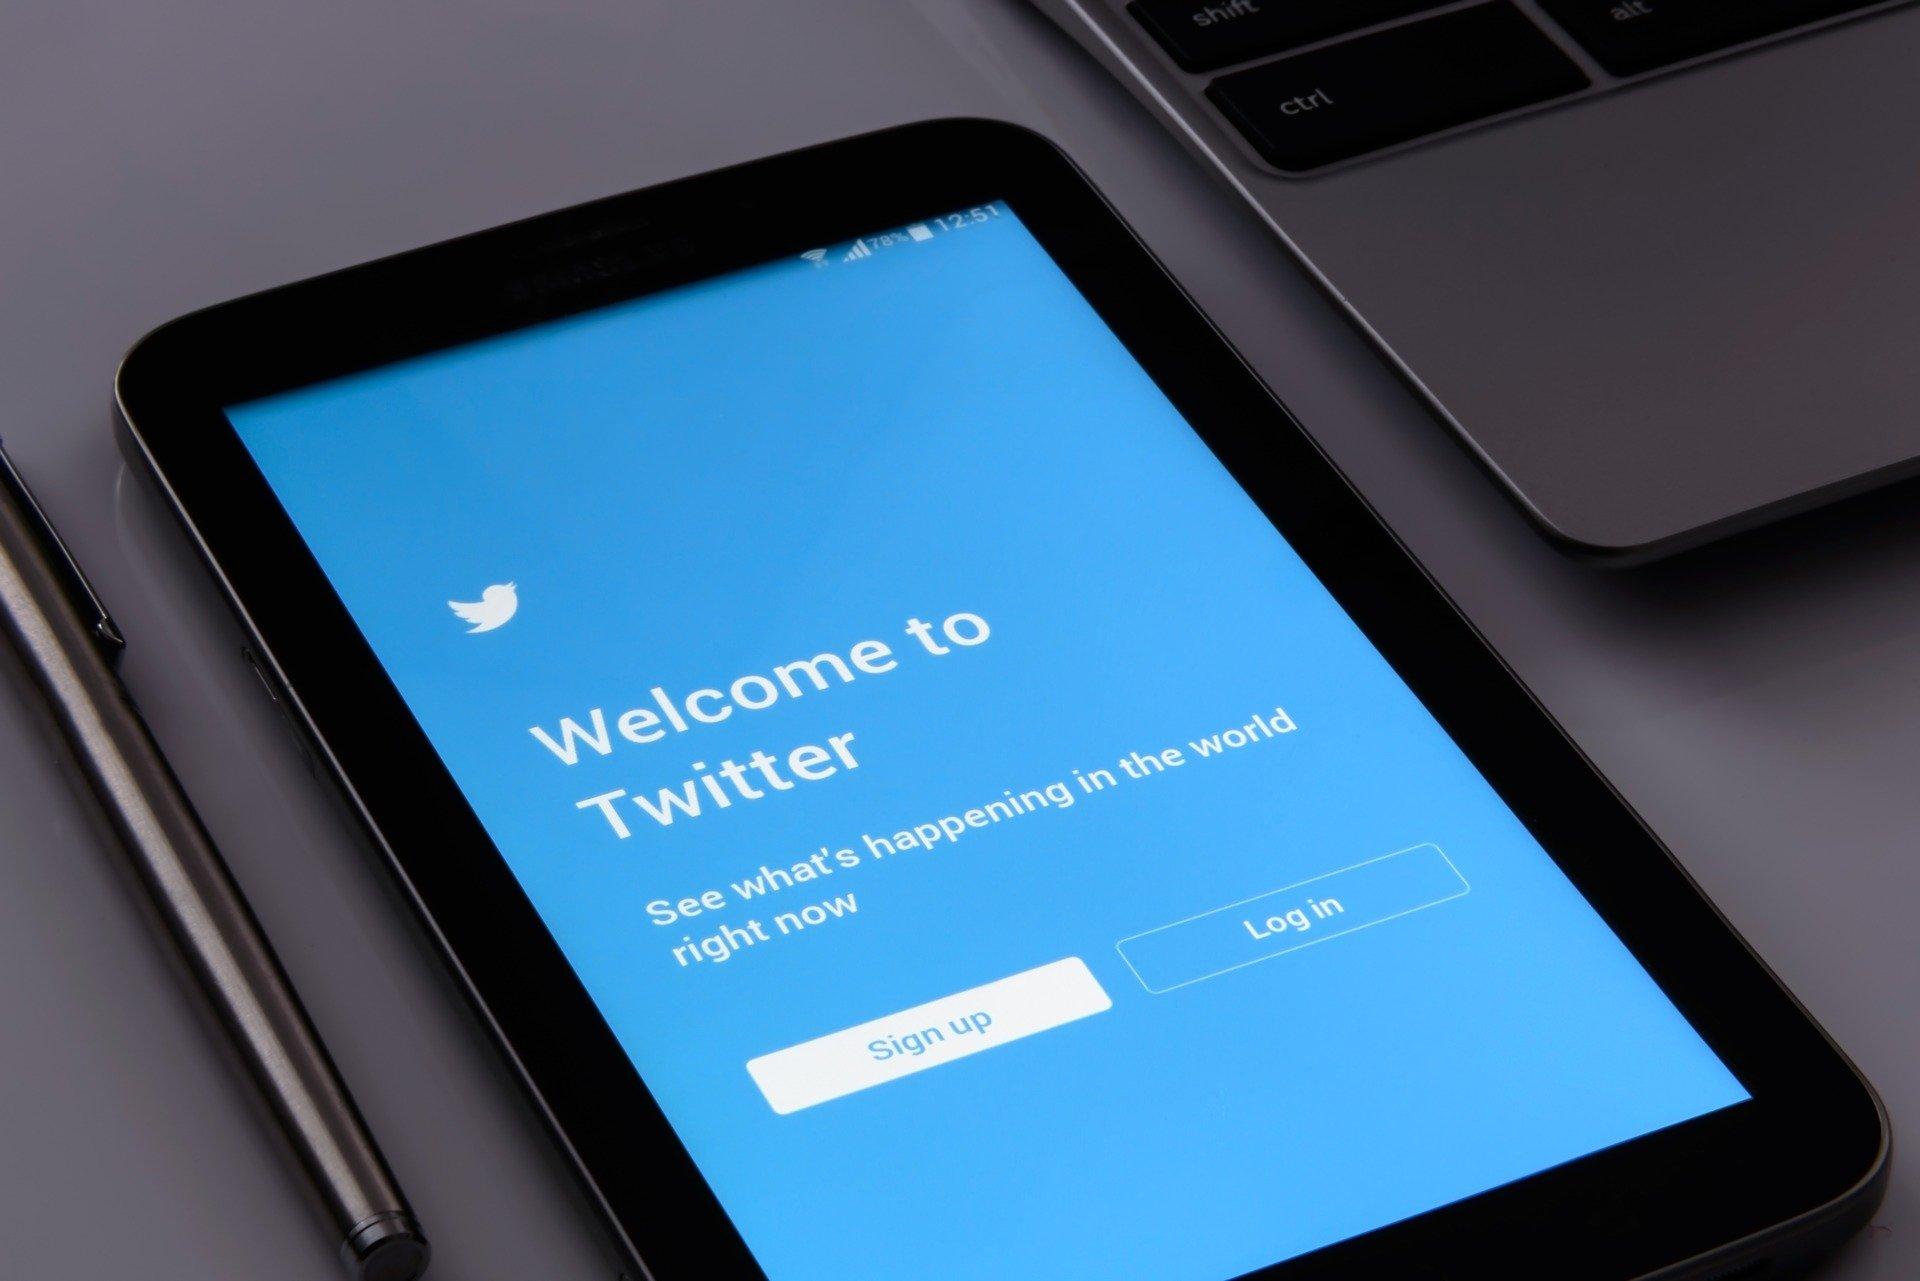 Twitter Screen Social Phone Cellular Phone